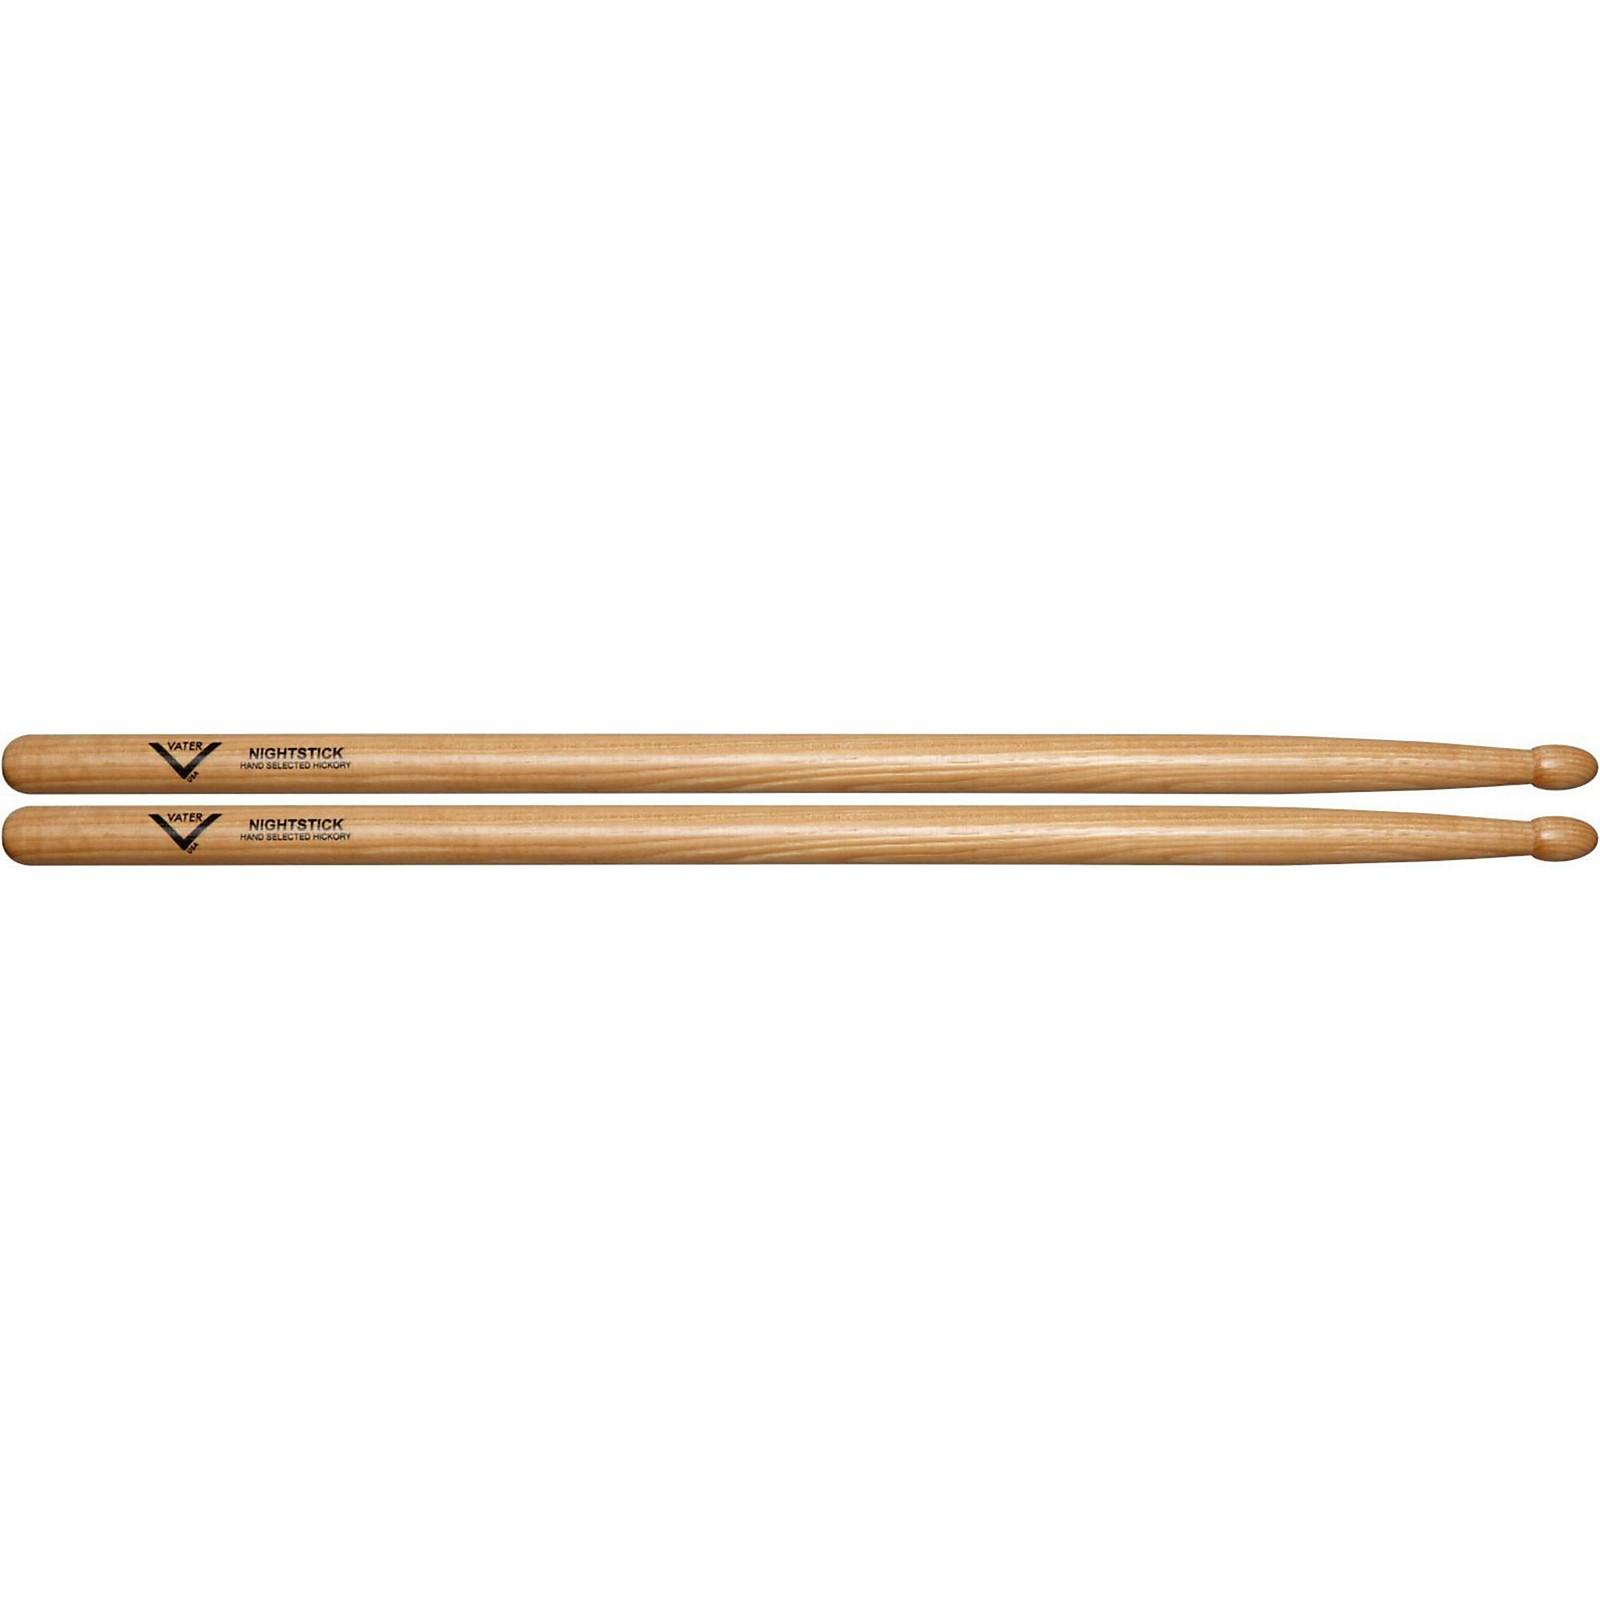 Vater American Hickory Nightstick 2S Drum Sticks